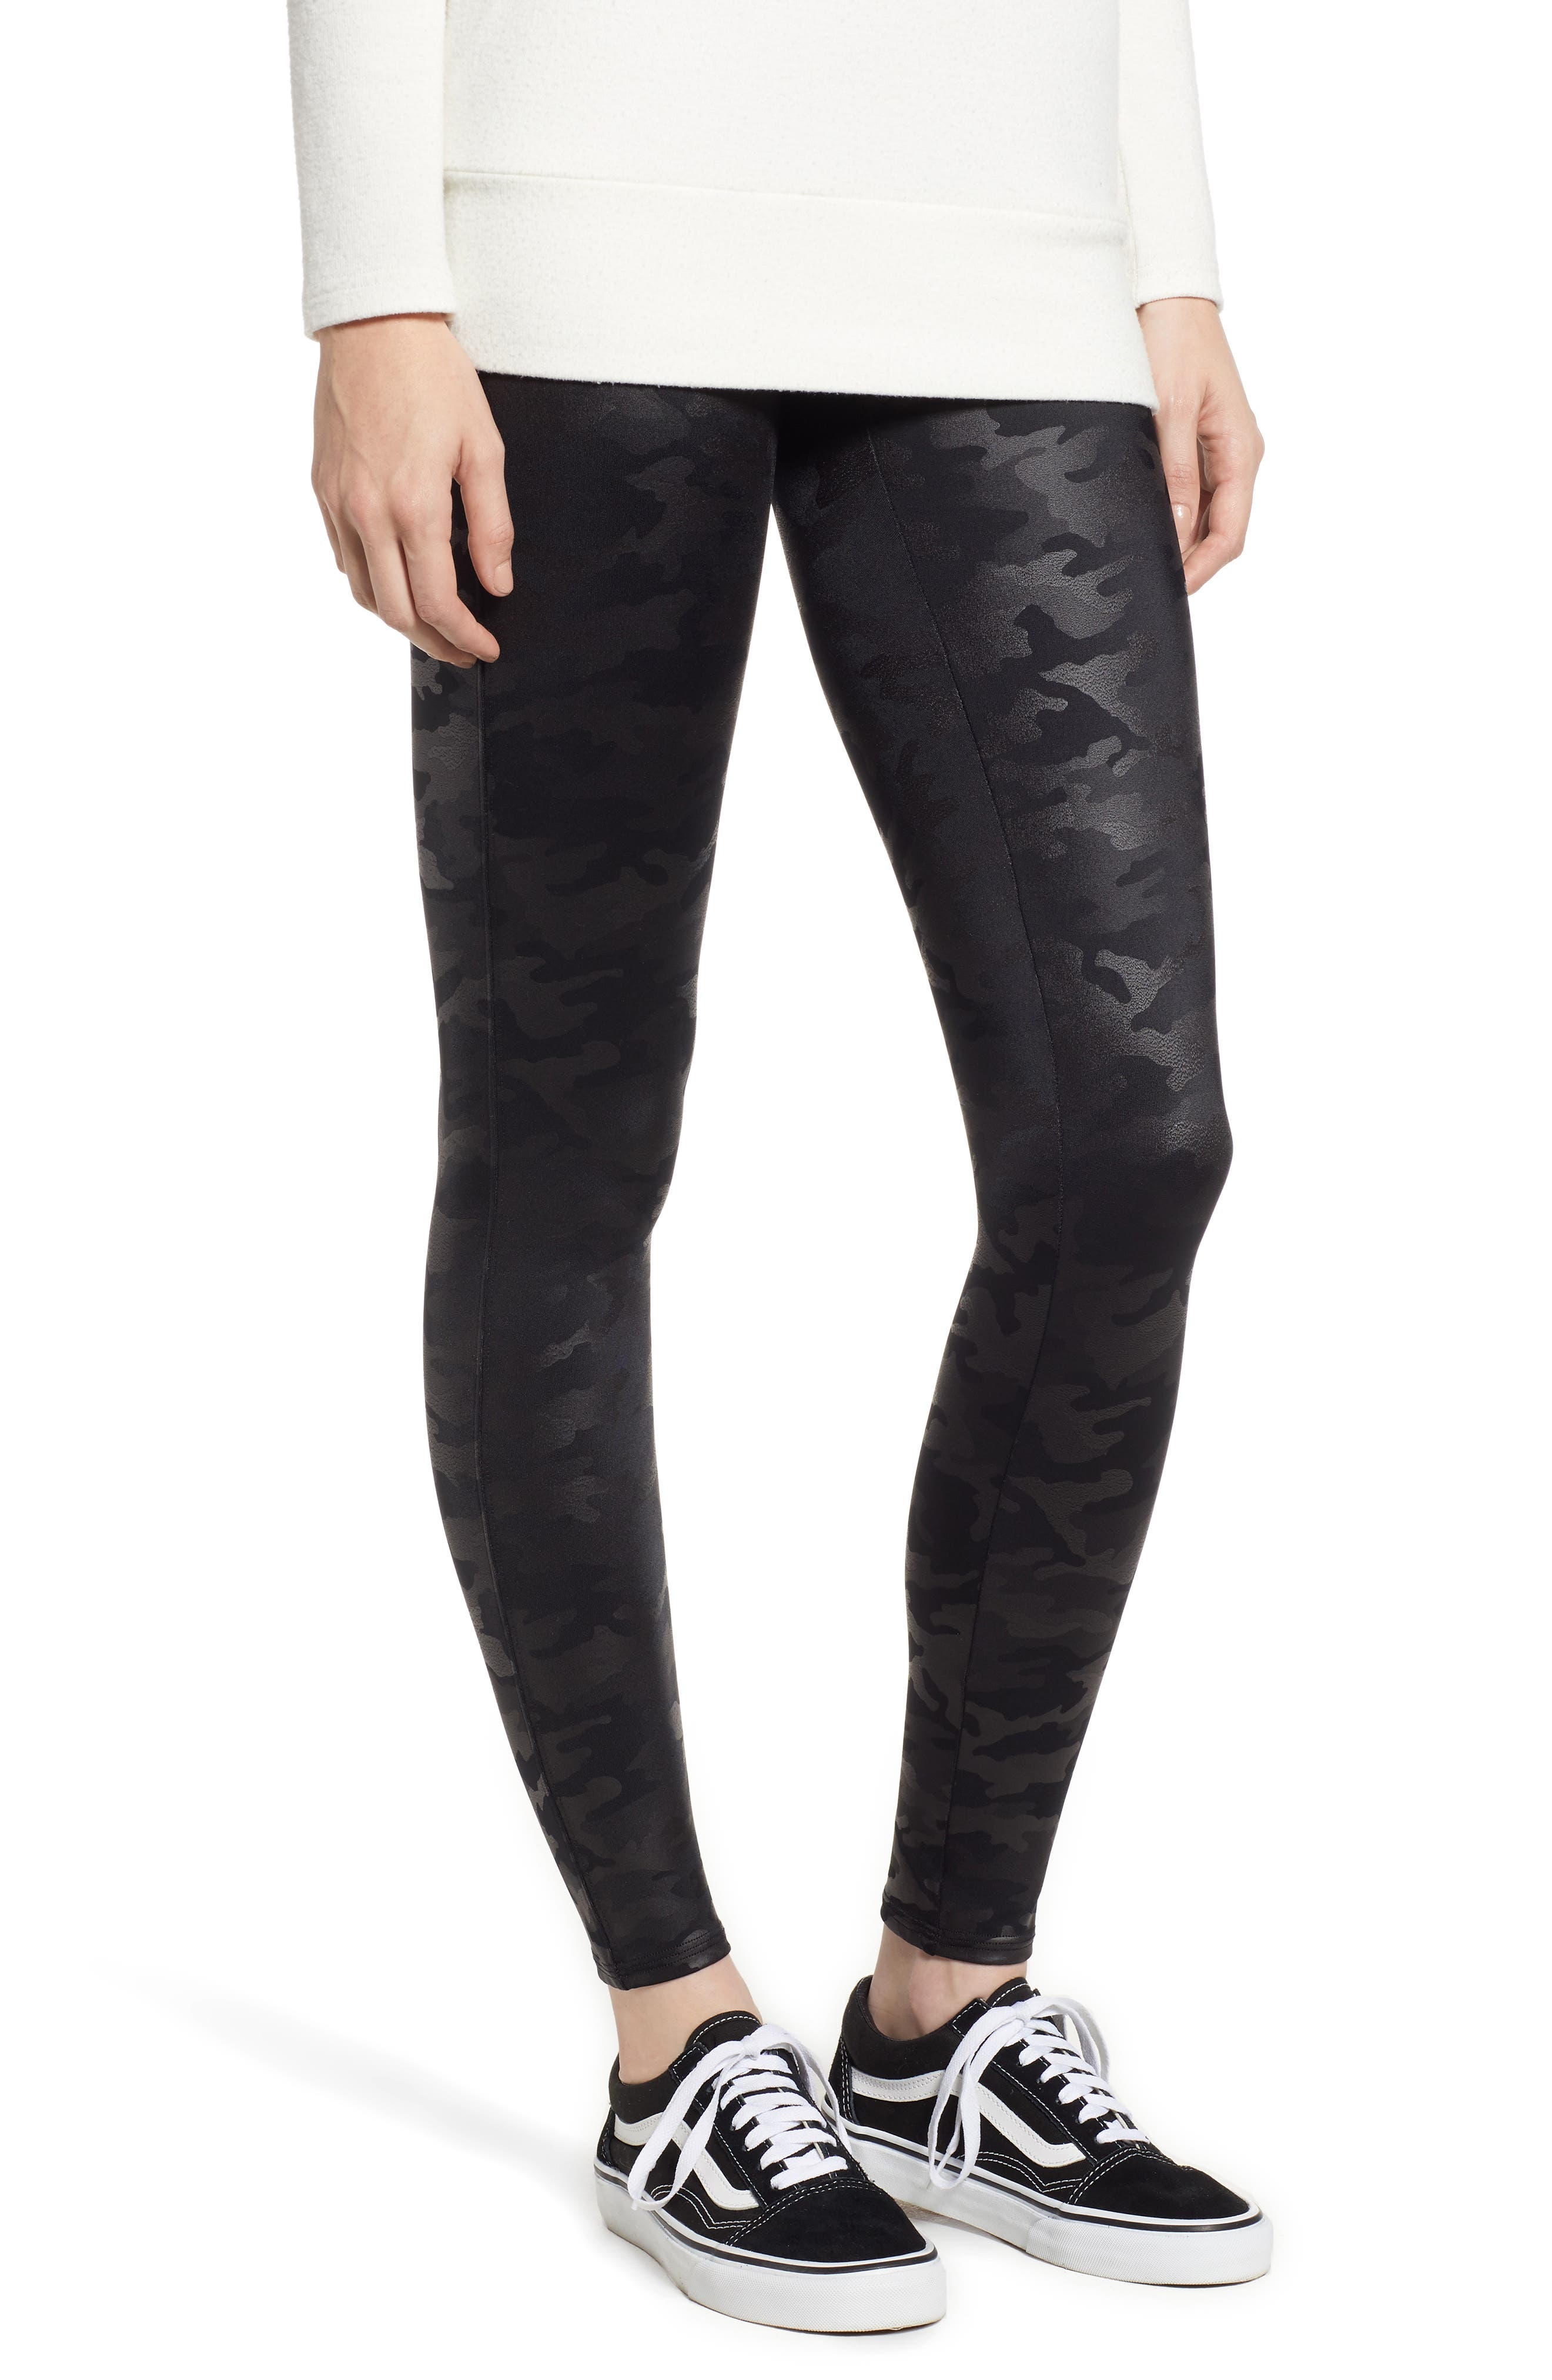 SPANXR Petite Women's Spanx Camo Faux Leather Leggings